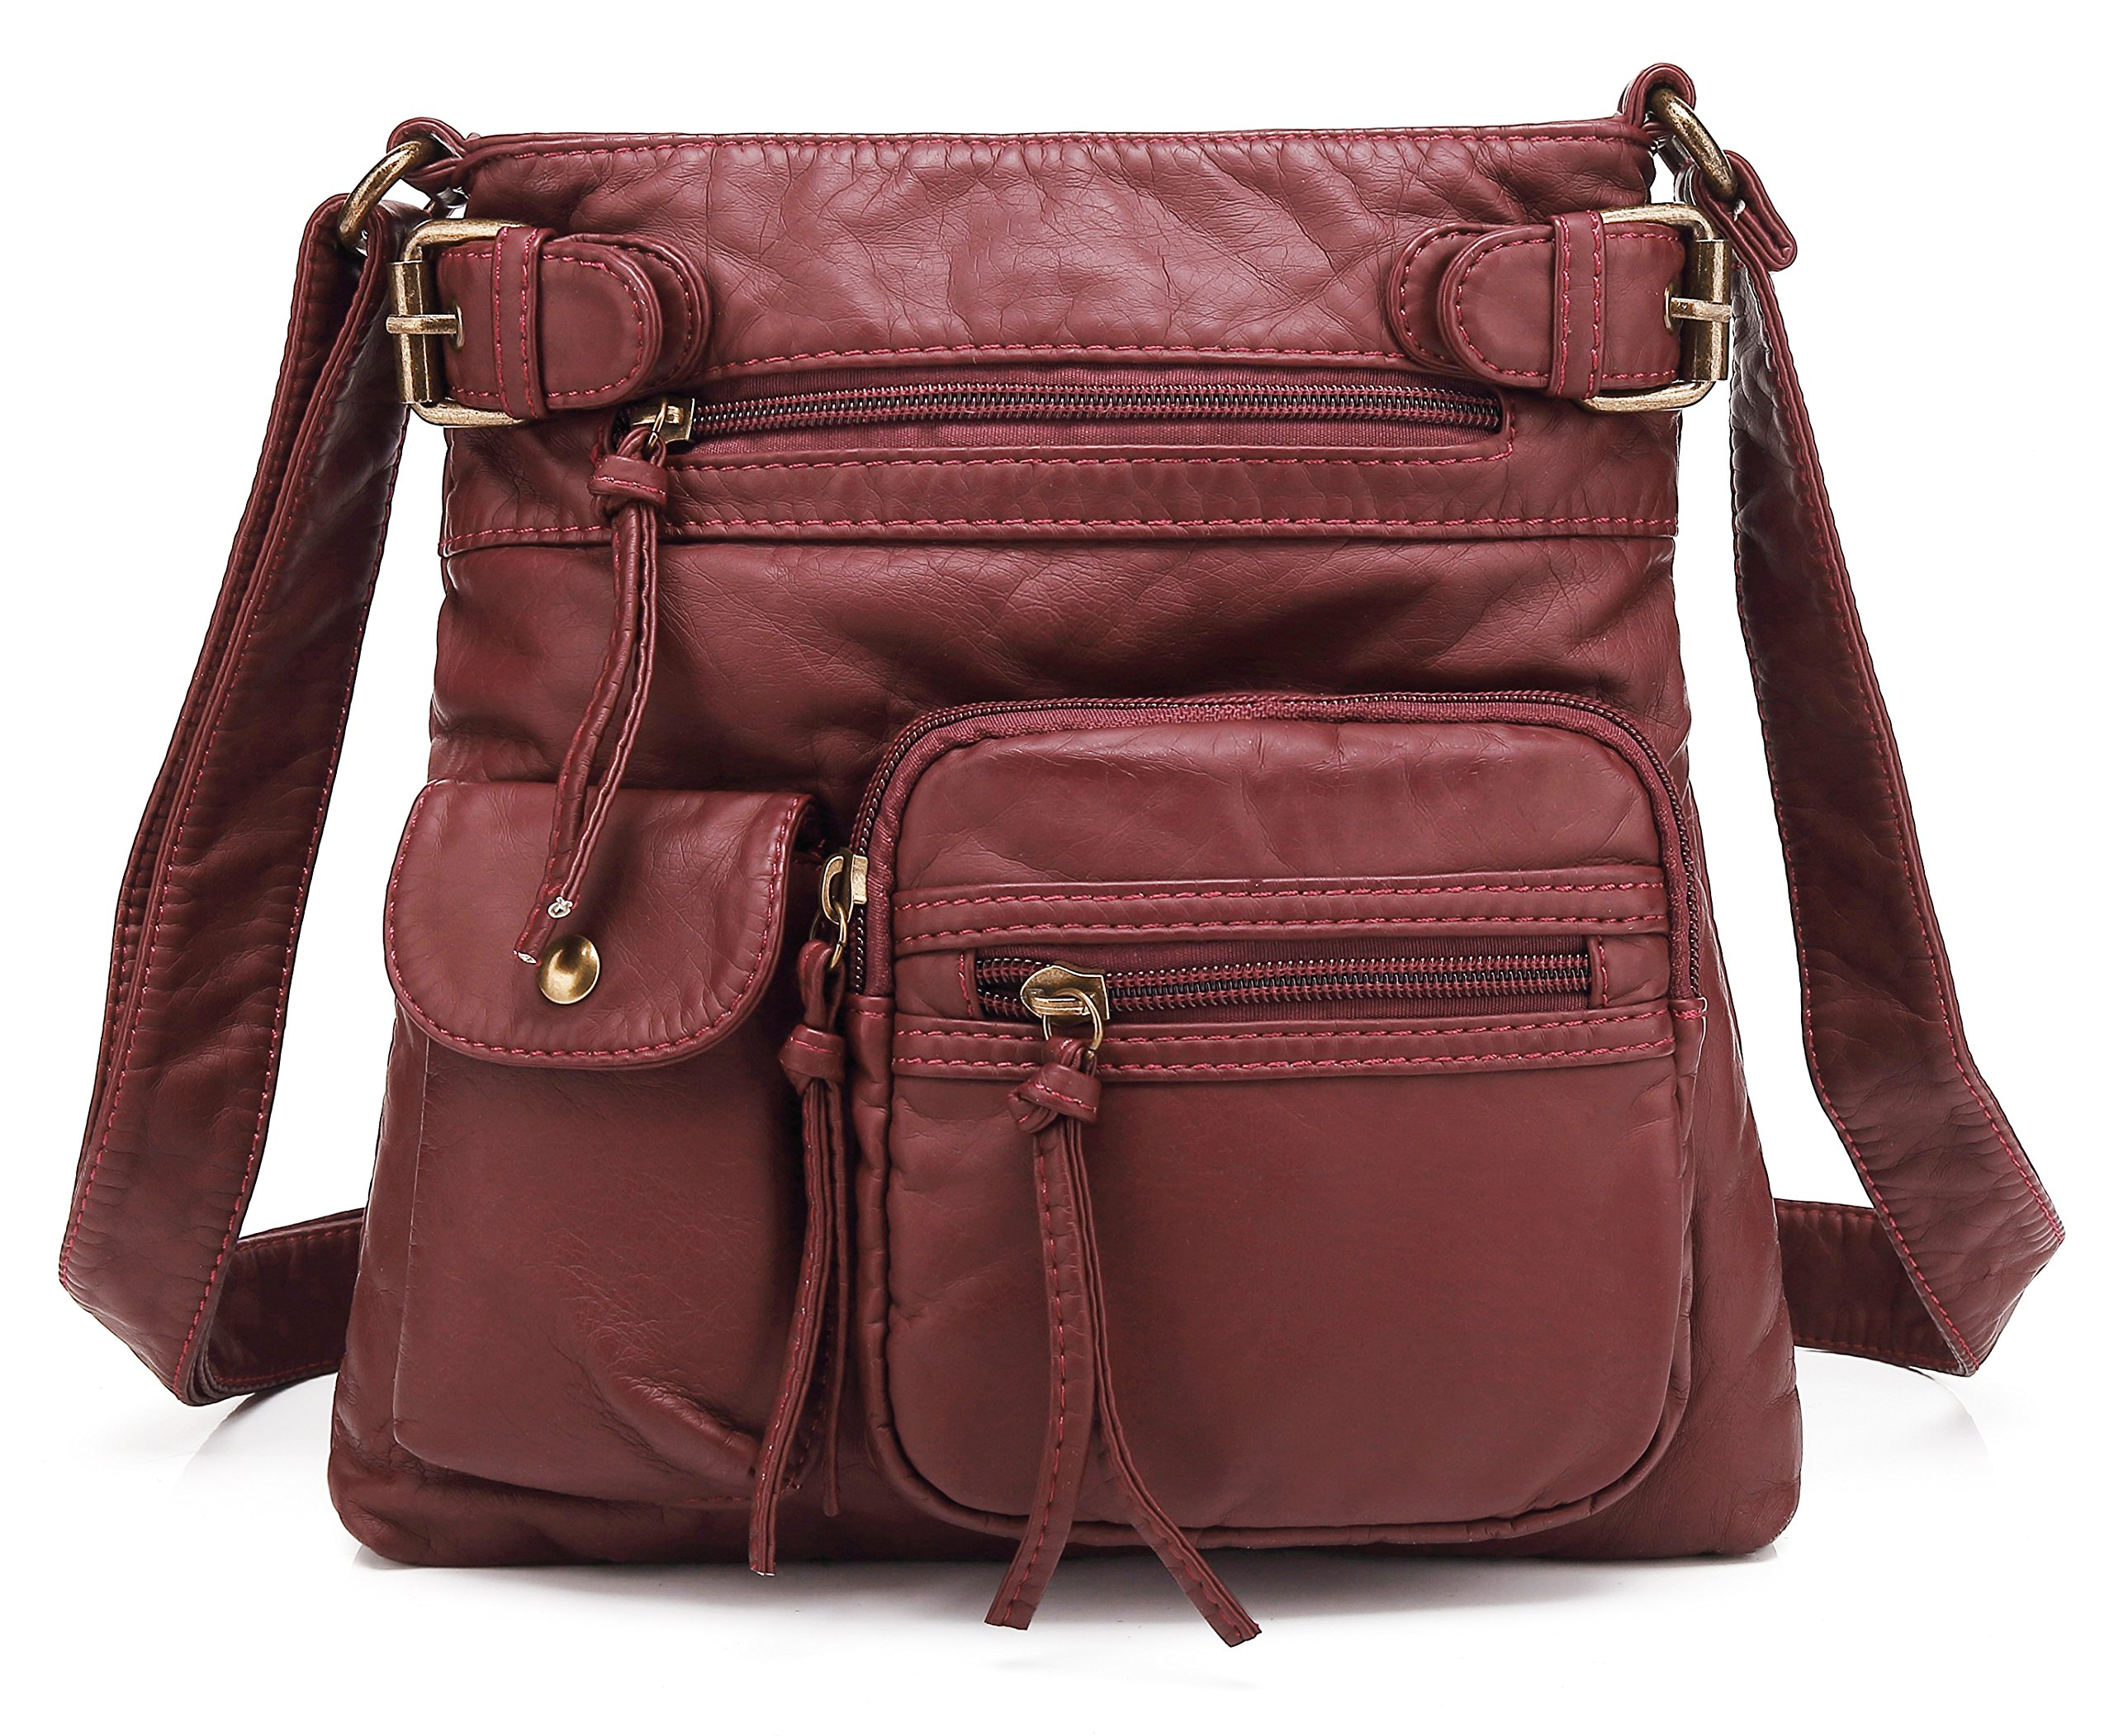 Scarleton Small Multi Pocket Crossbody Bag for Women, Ultra Soft Washed Vegan Leather Shoulder Purse, Burgundy, H183320